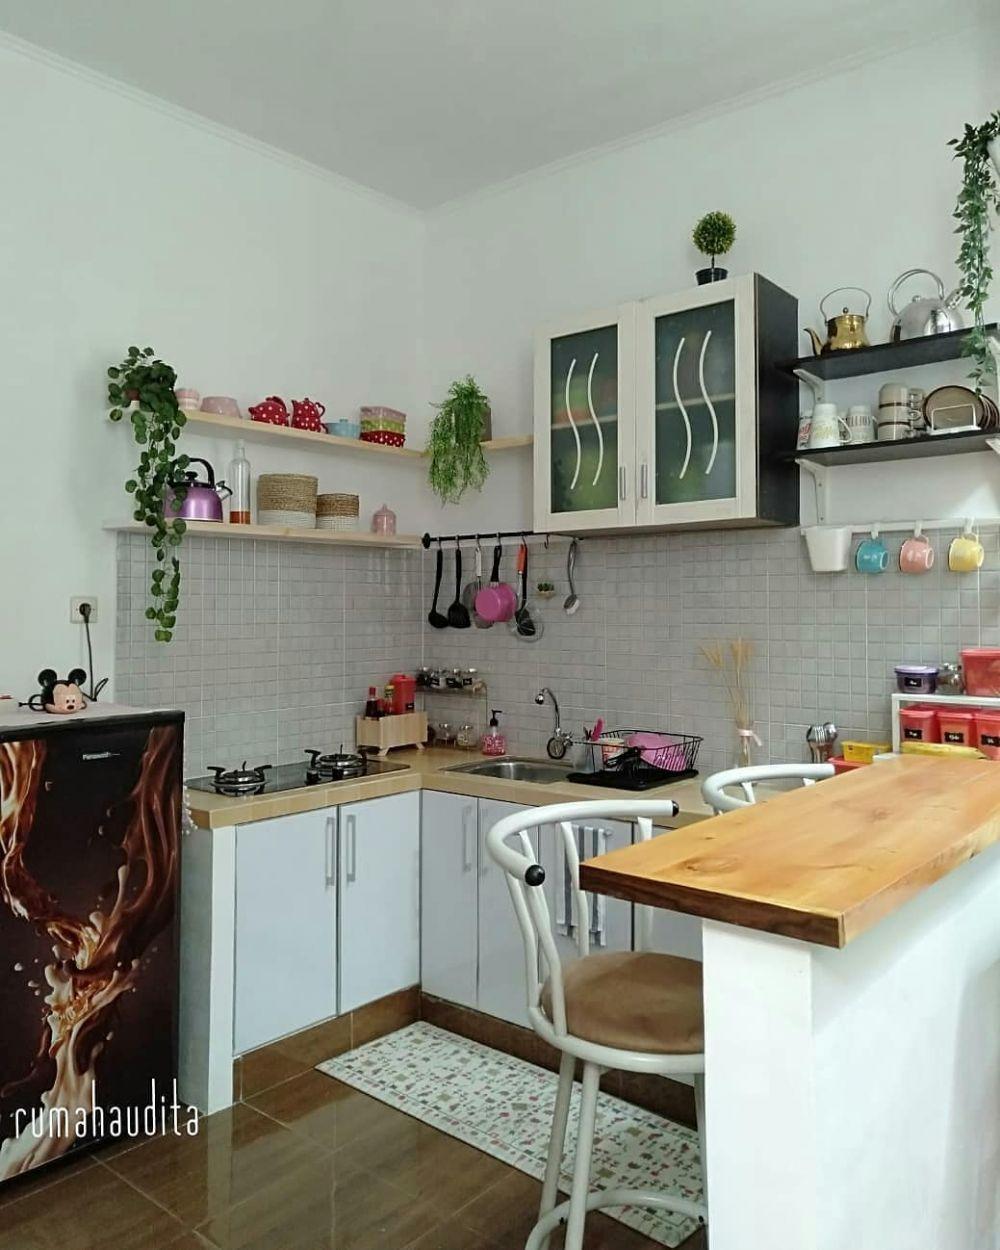 Desain Dapur Sehat Minimalis Cek Bahan Bangunan Dapur sehat minimalis